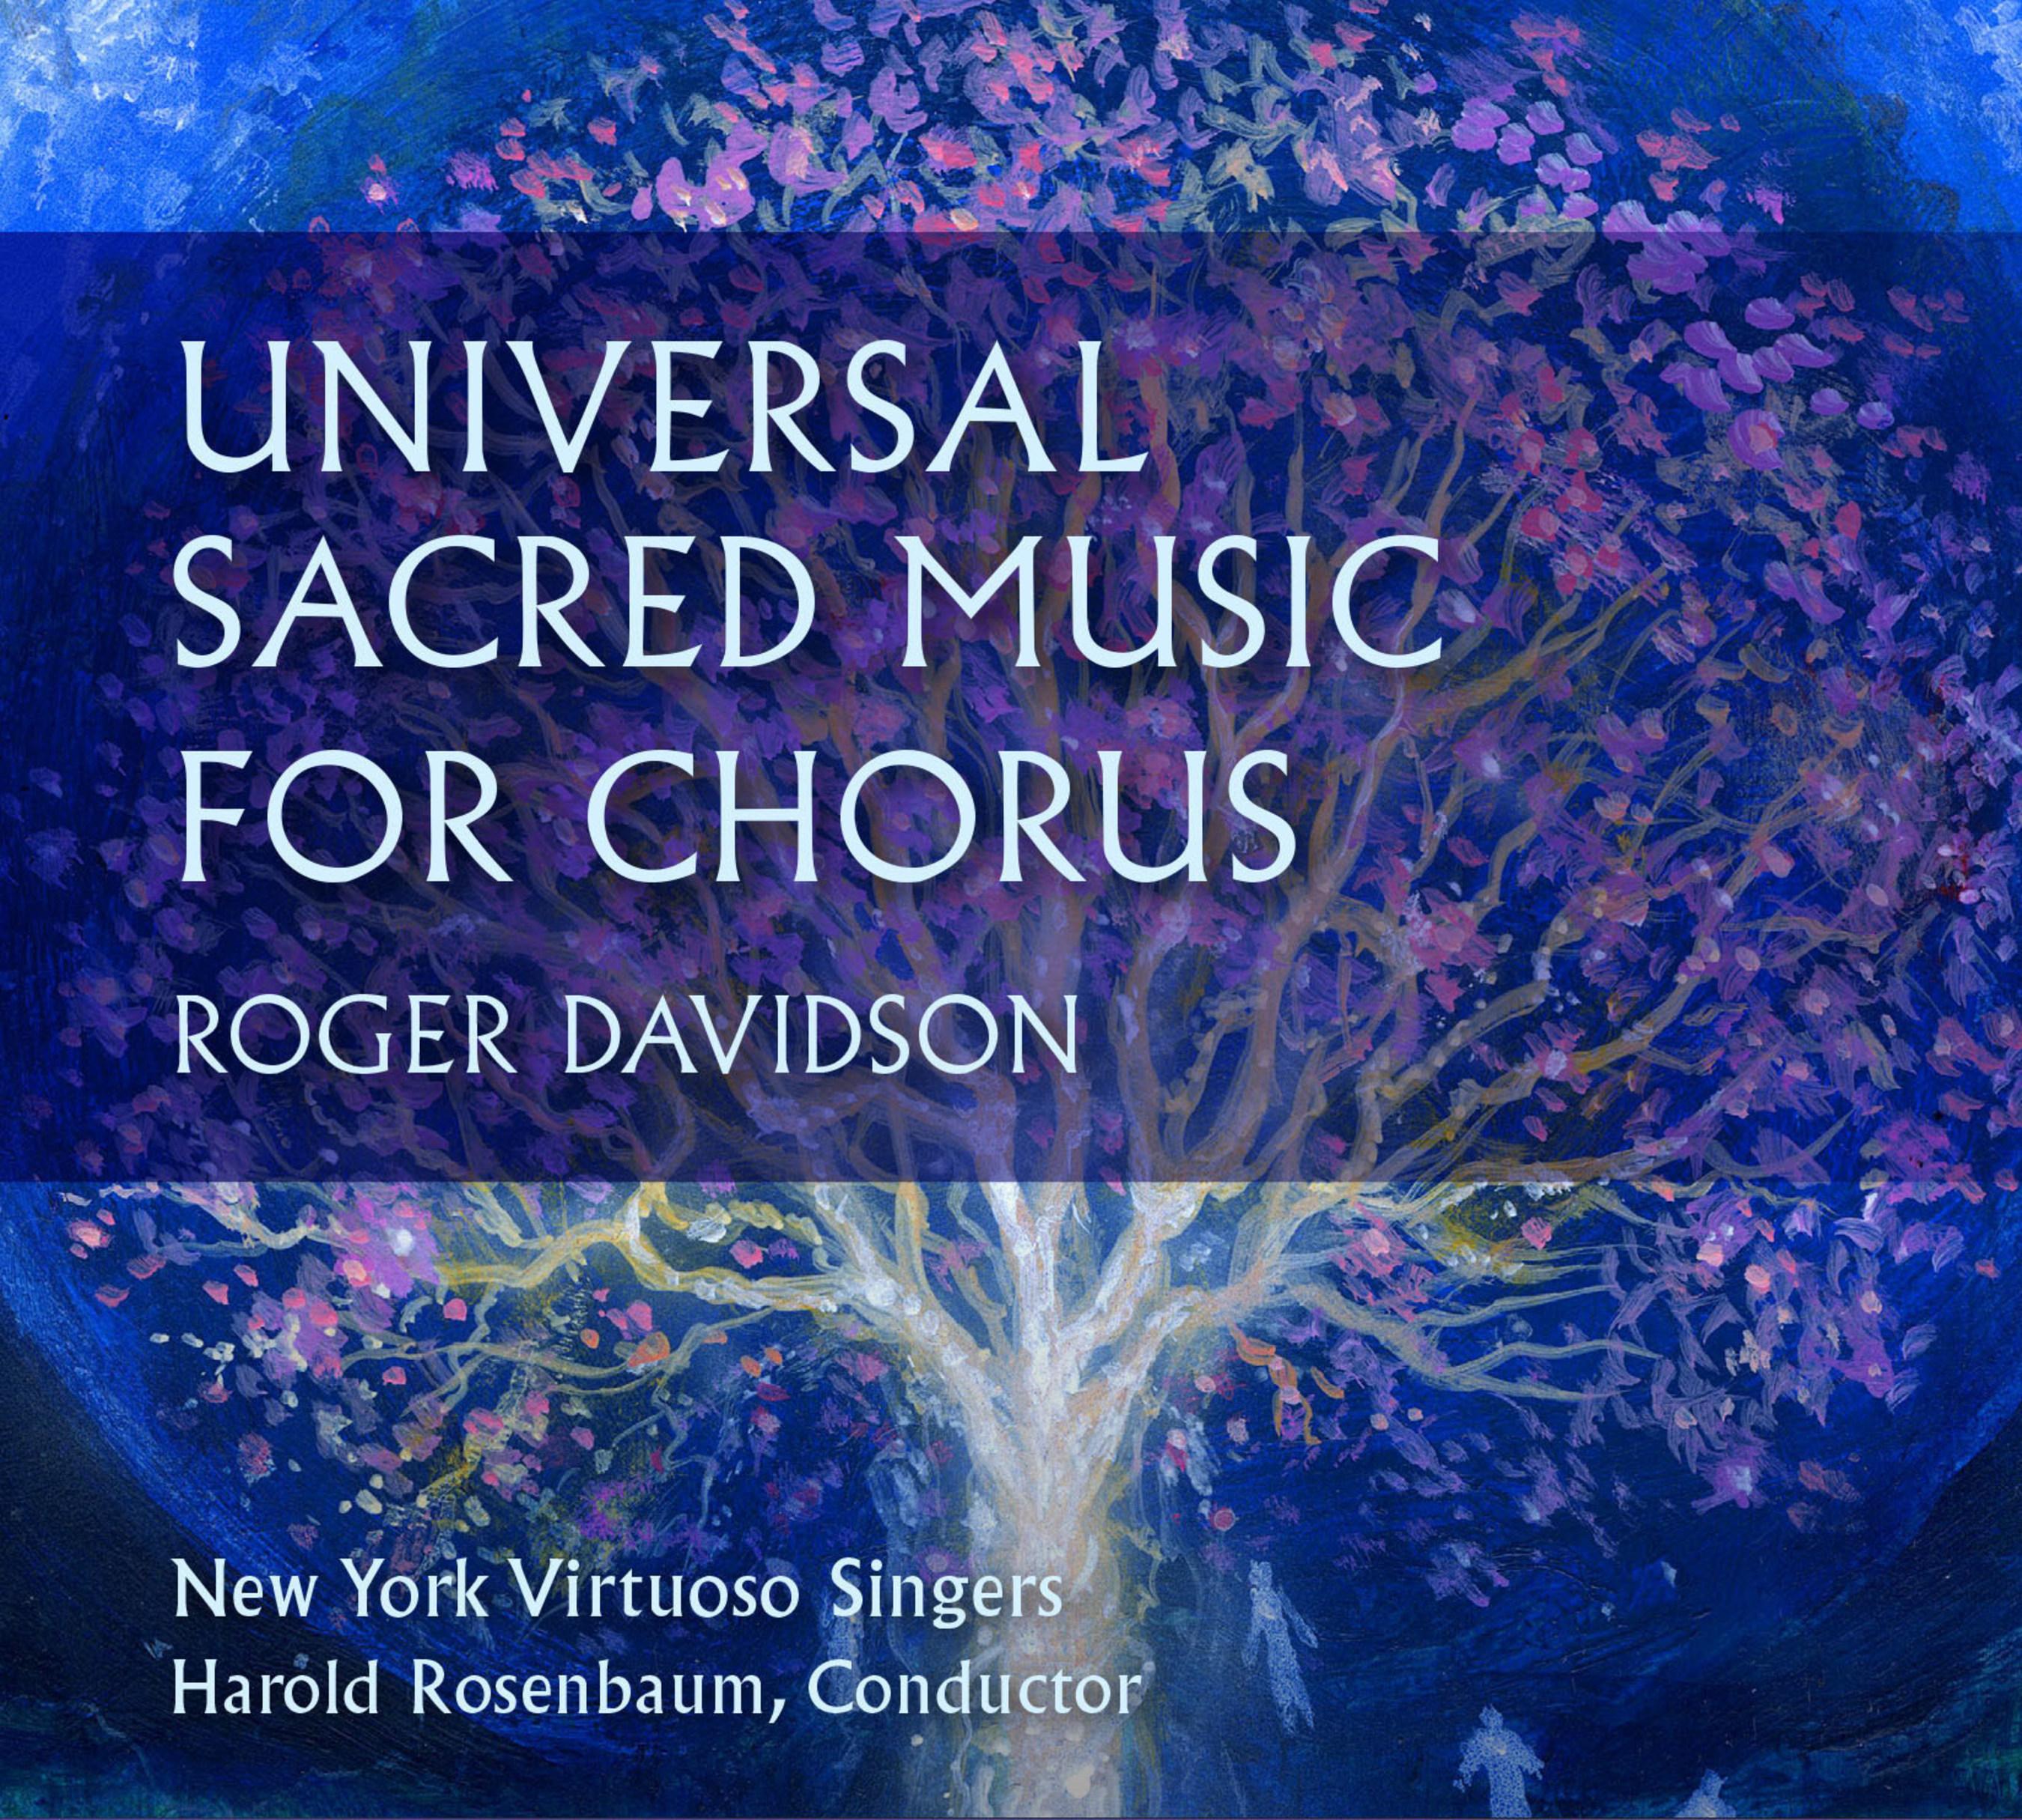 Soundbrush Records Presents Universal Sacred Music for Chorus, a New Album by Roger Davidson